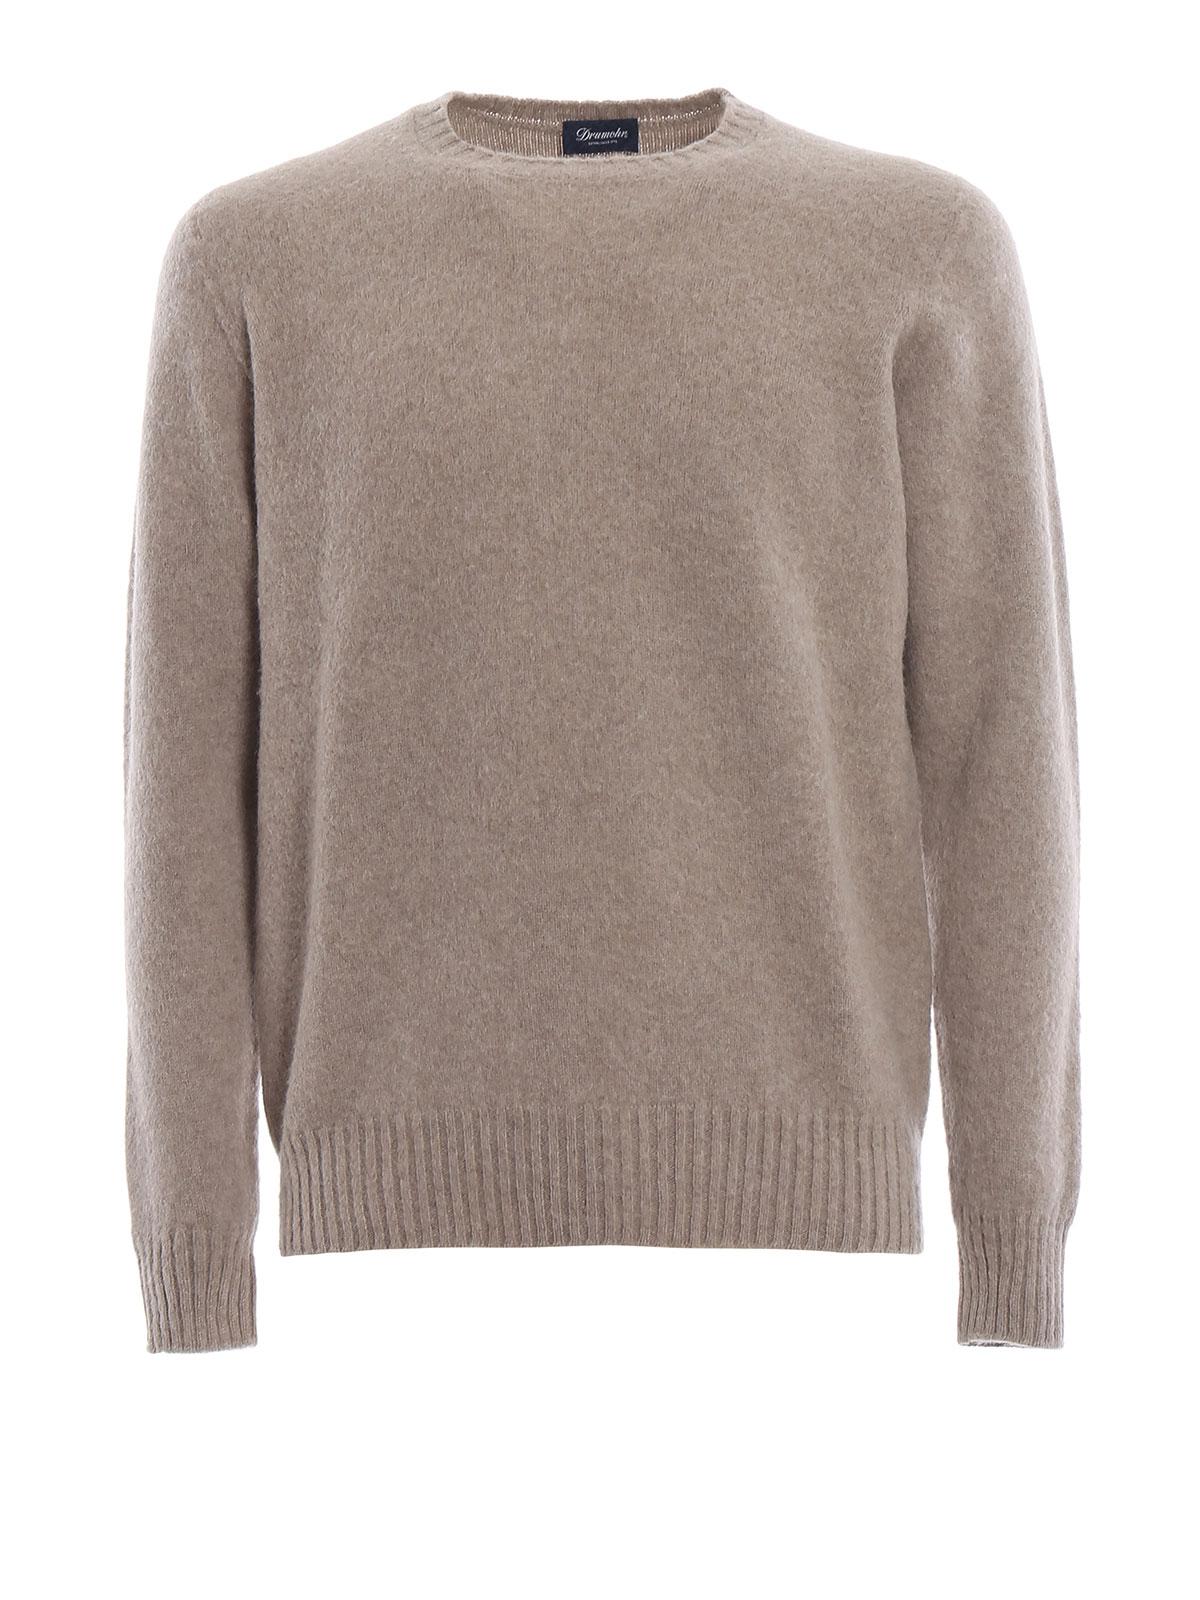 bd5d0b93ab7a4a Drumohr - Beige brushed lambswool sweater - crew necks - D8W103G540